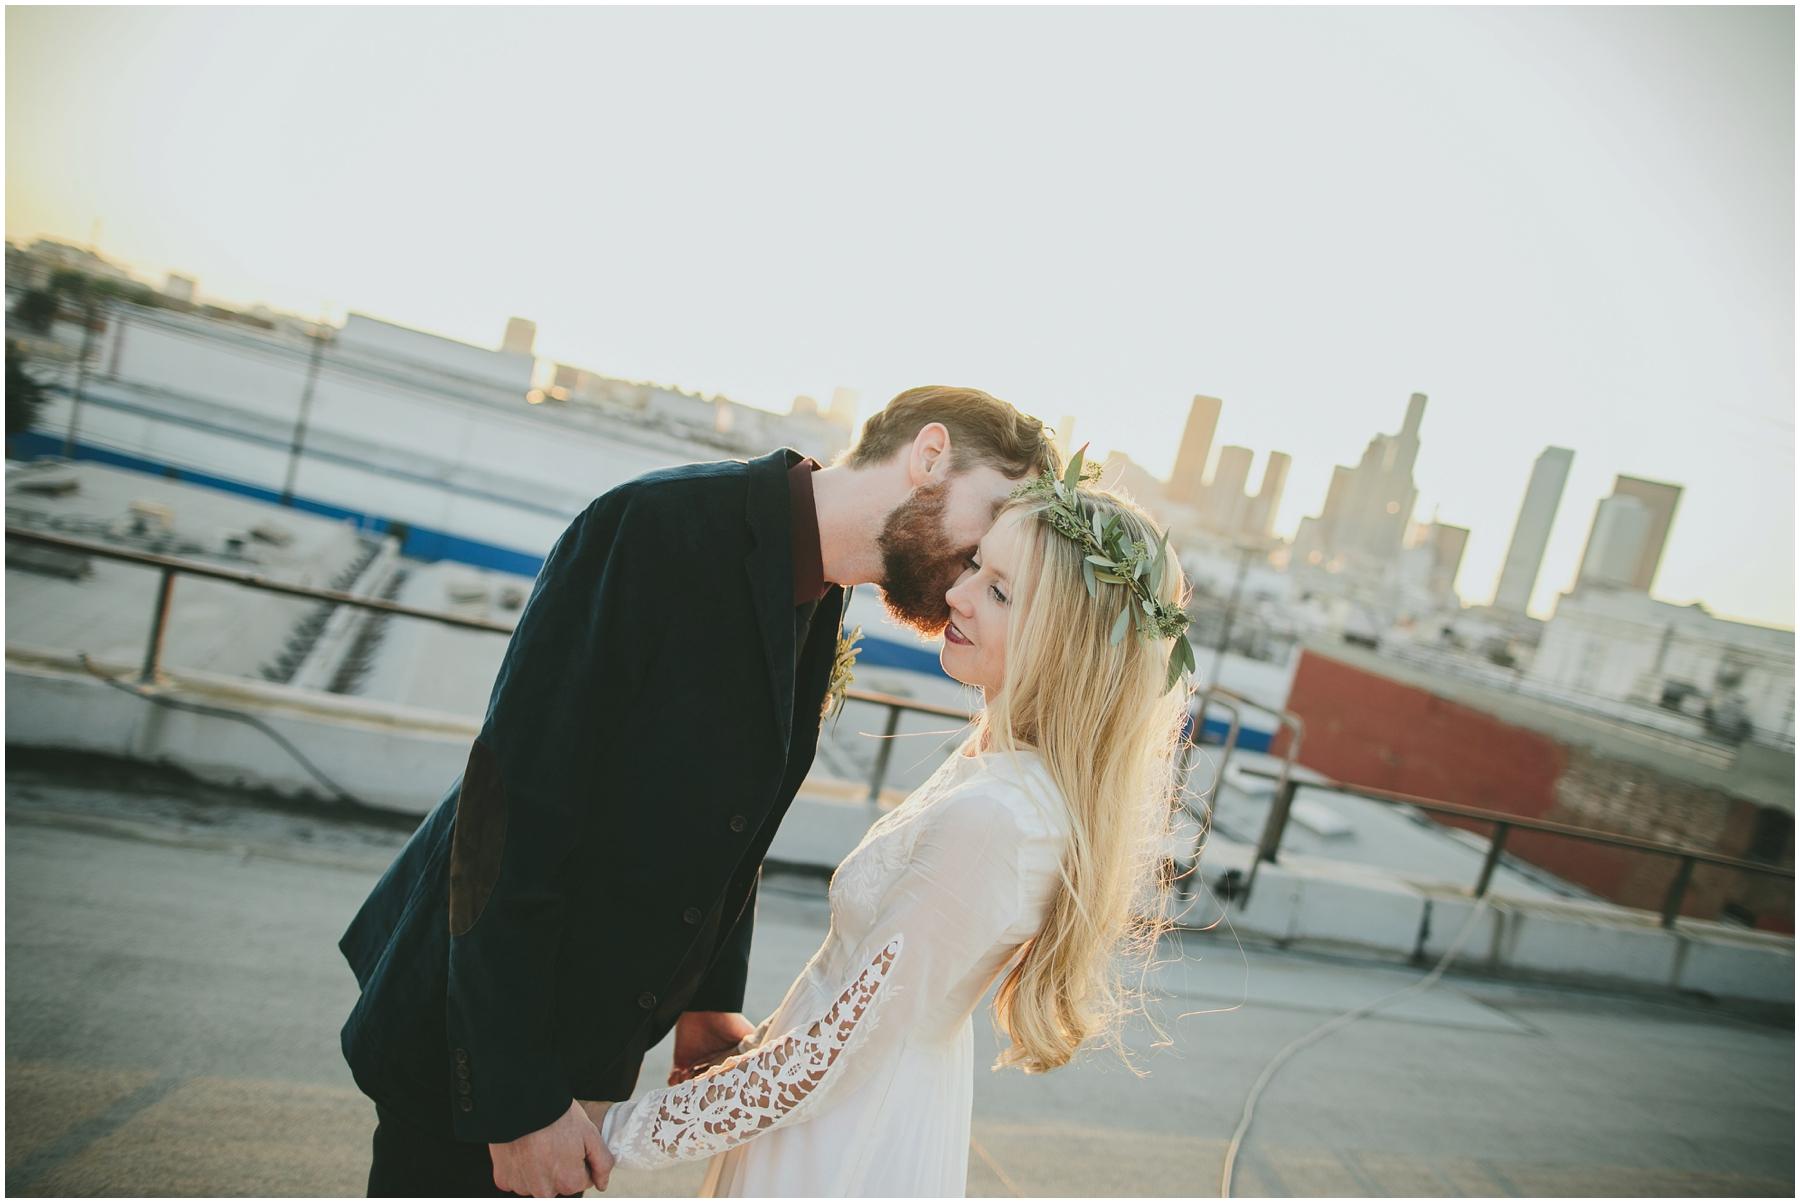 Natalie+Corey-WEDDING_KELLYBOITANO_0110